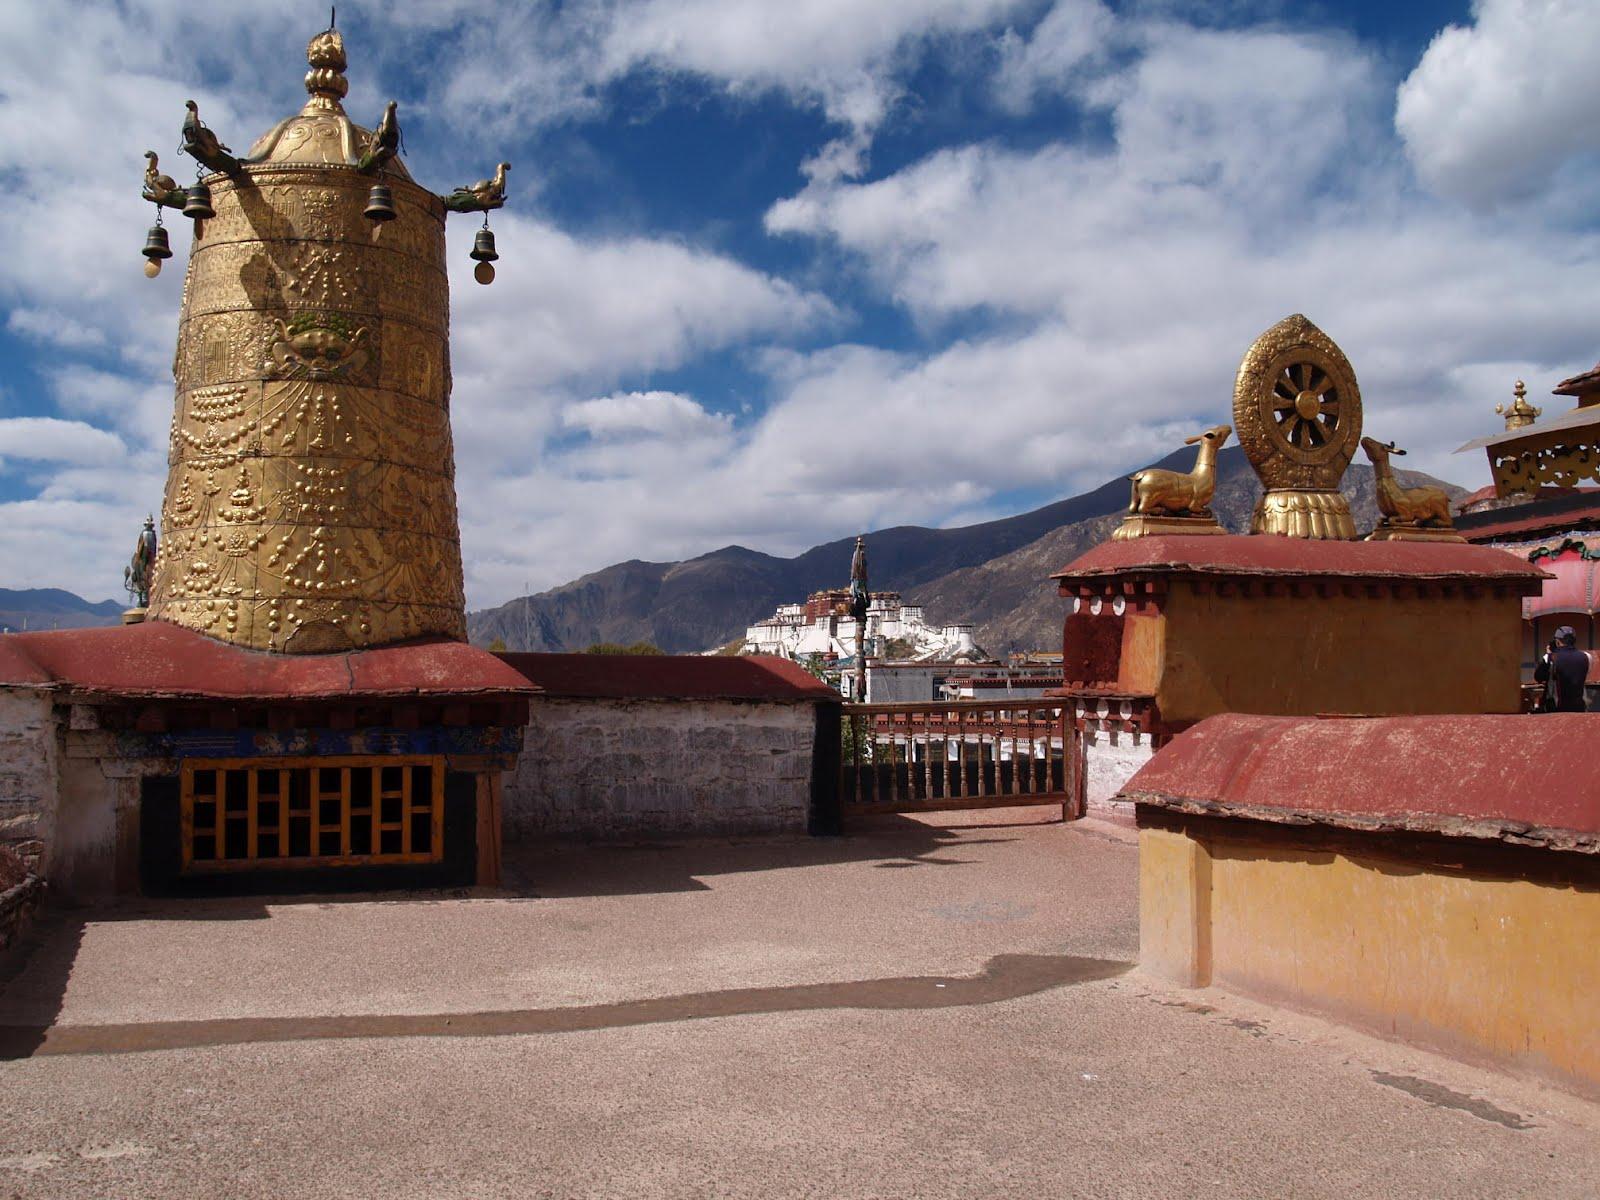 http://1.bp.blogspot.com/-3KRYDDcUtj4/UFWGXoorXLI/AAAAAAAAHTI/ViRdz1fBOz0/s1600/jokhang_temple___tibet.jpg